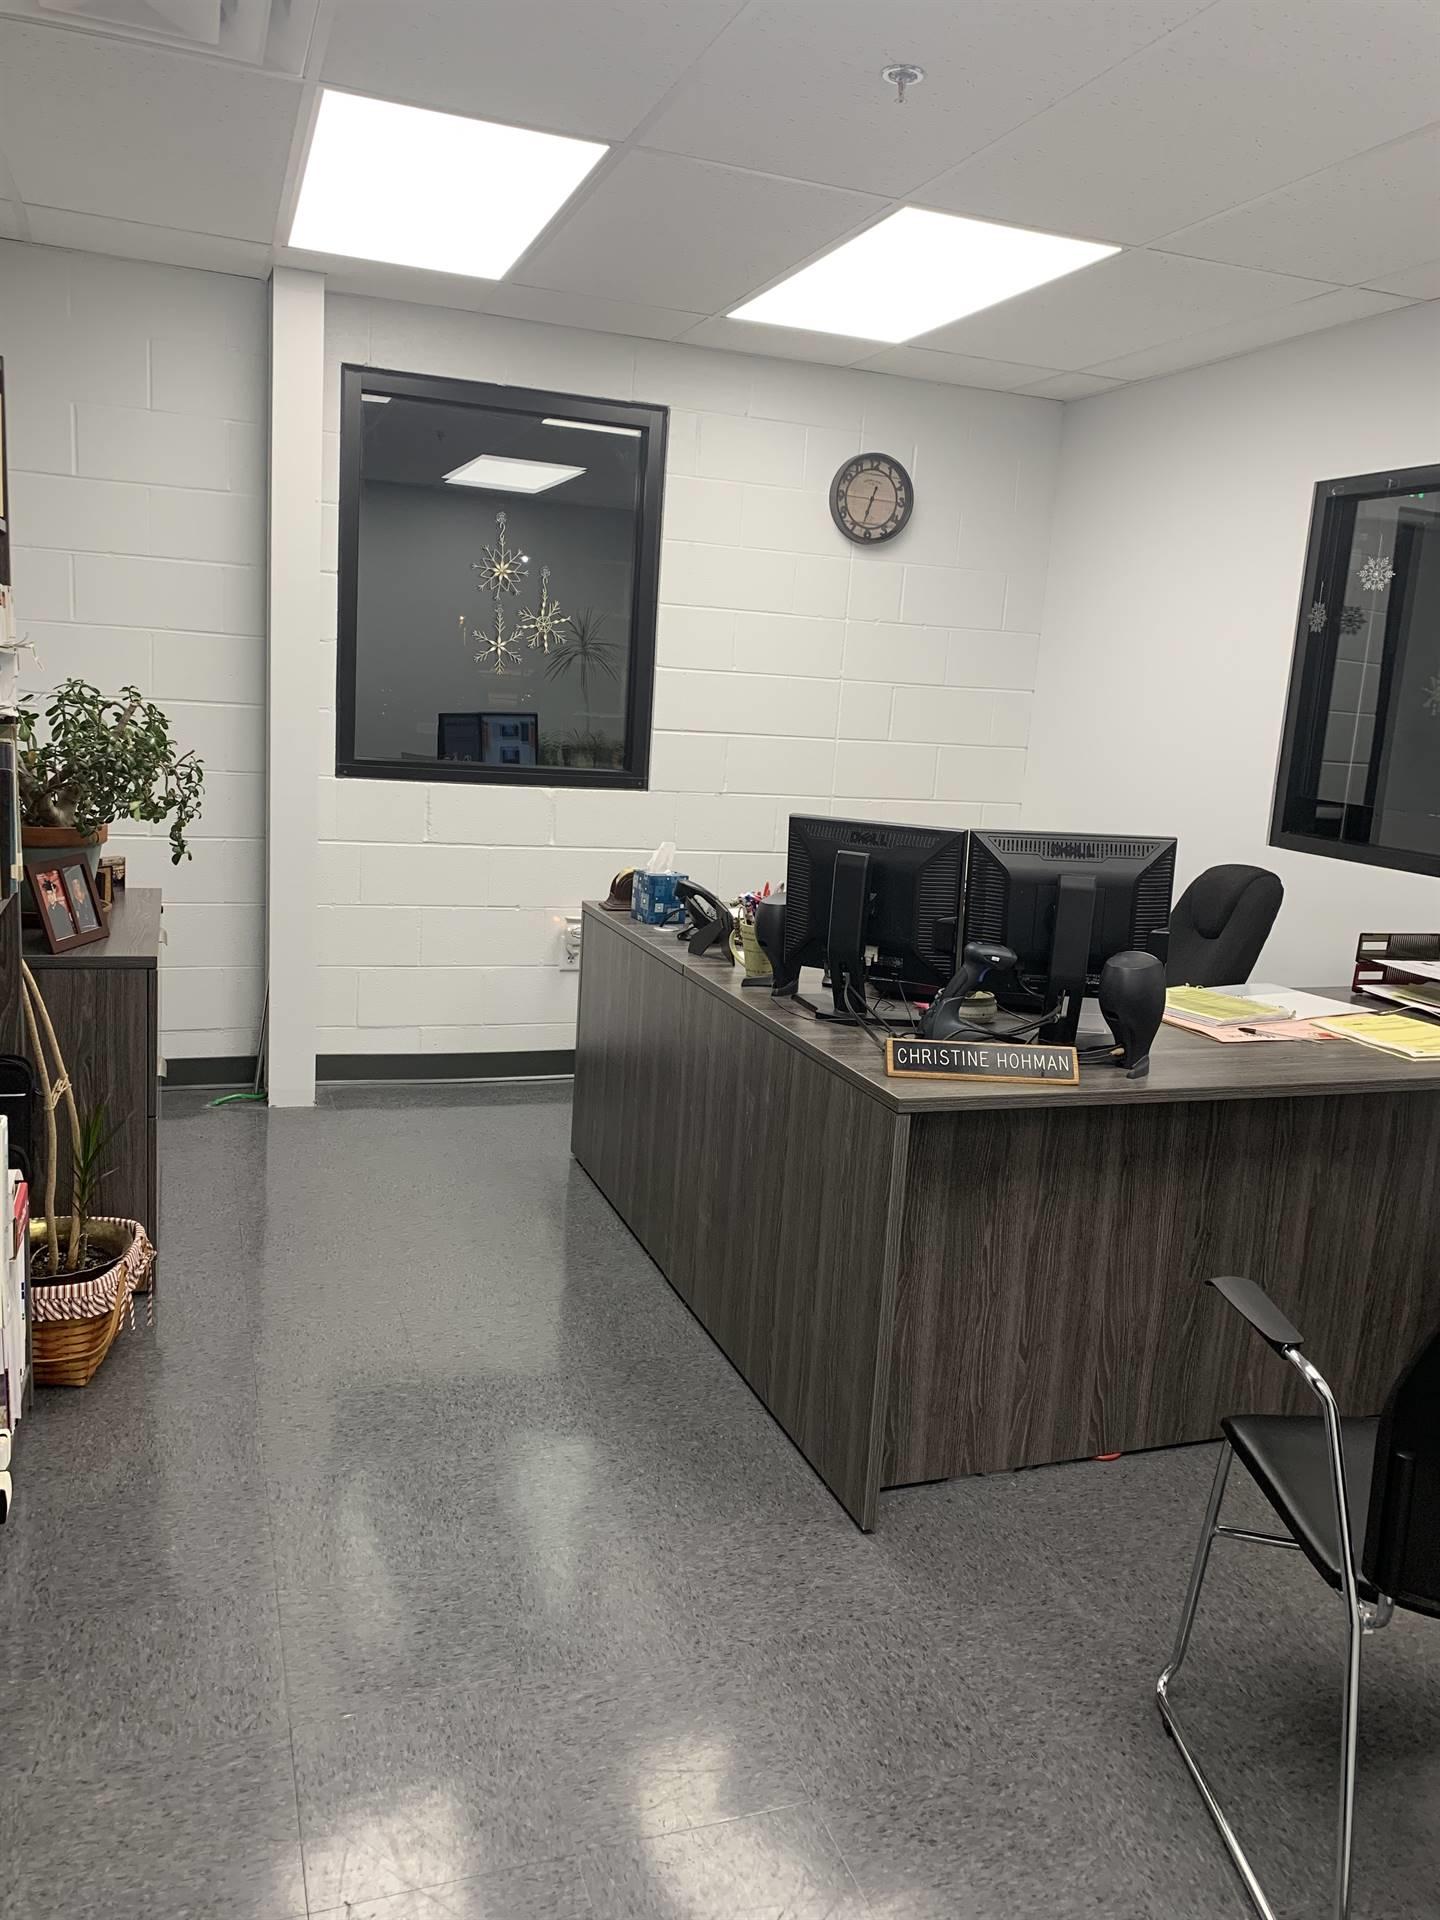 Maintenance secretary office